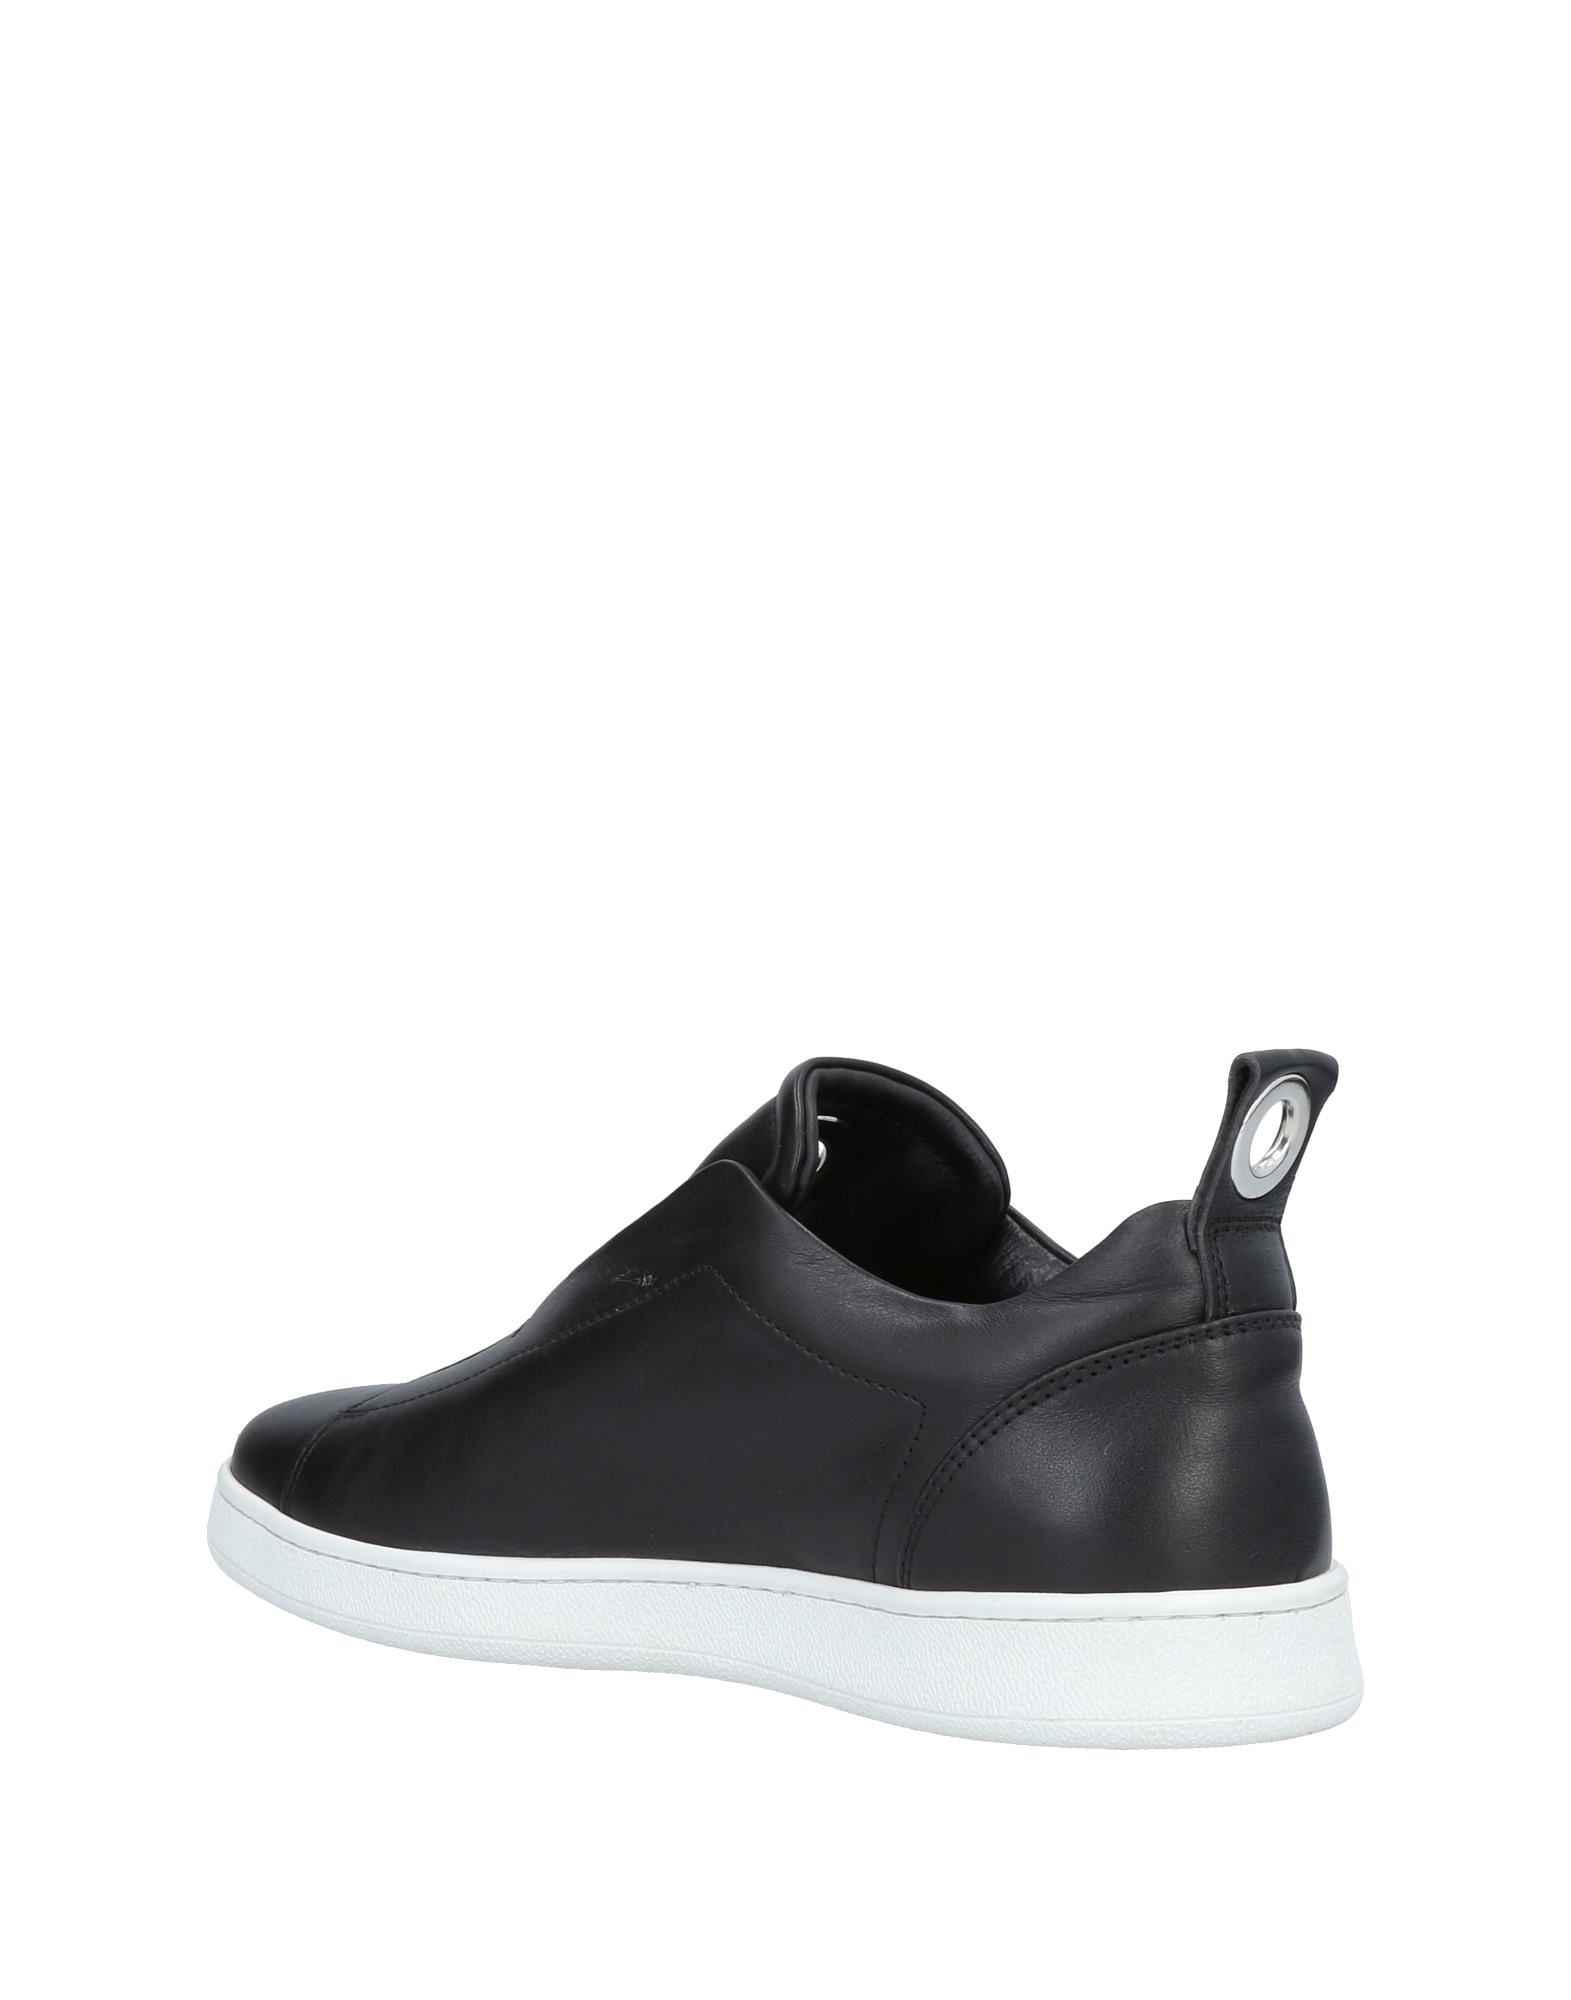 Stilvolle billige  Schuhe Dondup Sneakers Damen  billige 11480140TD 860541